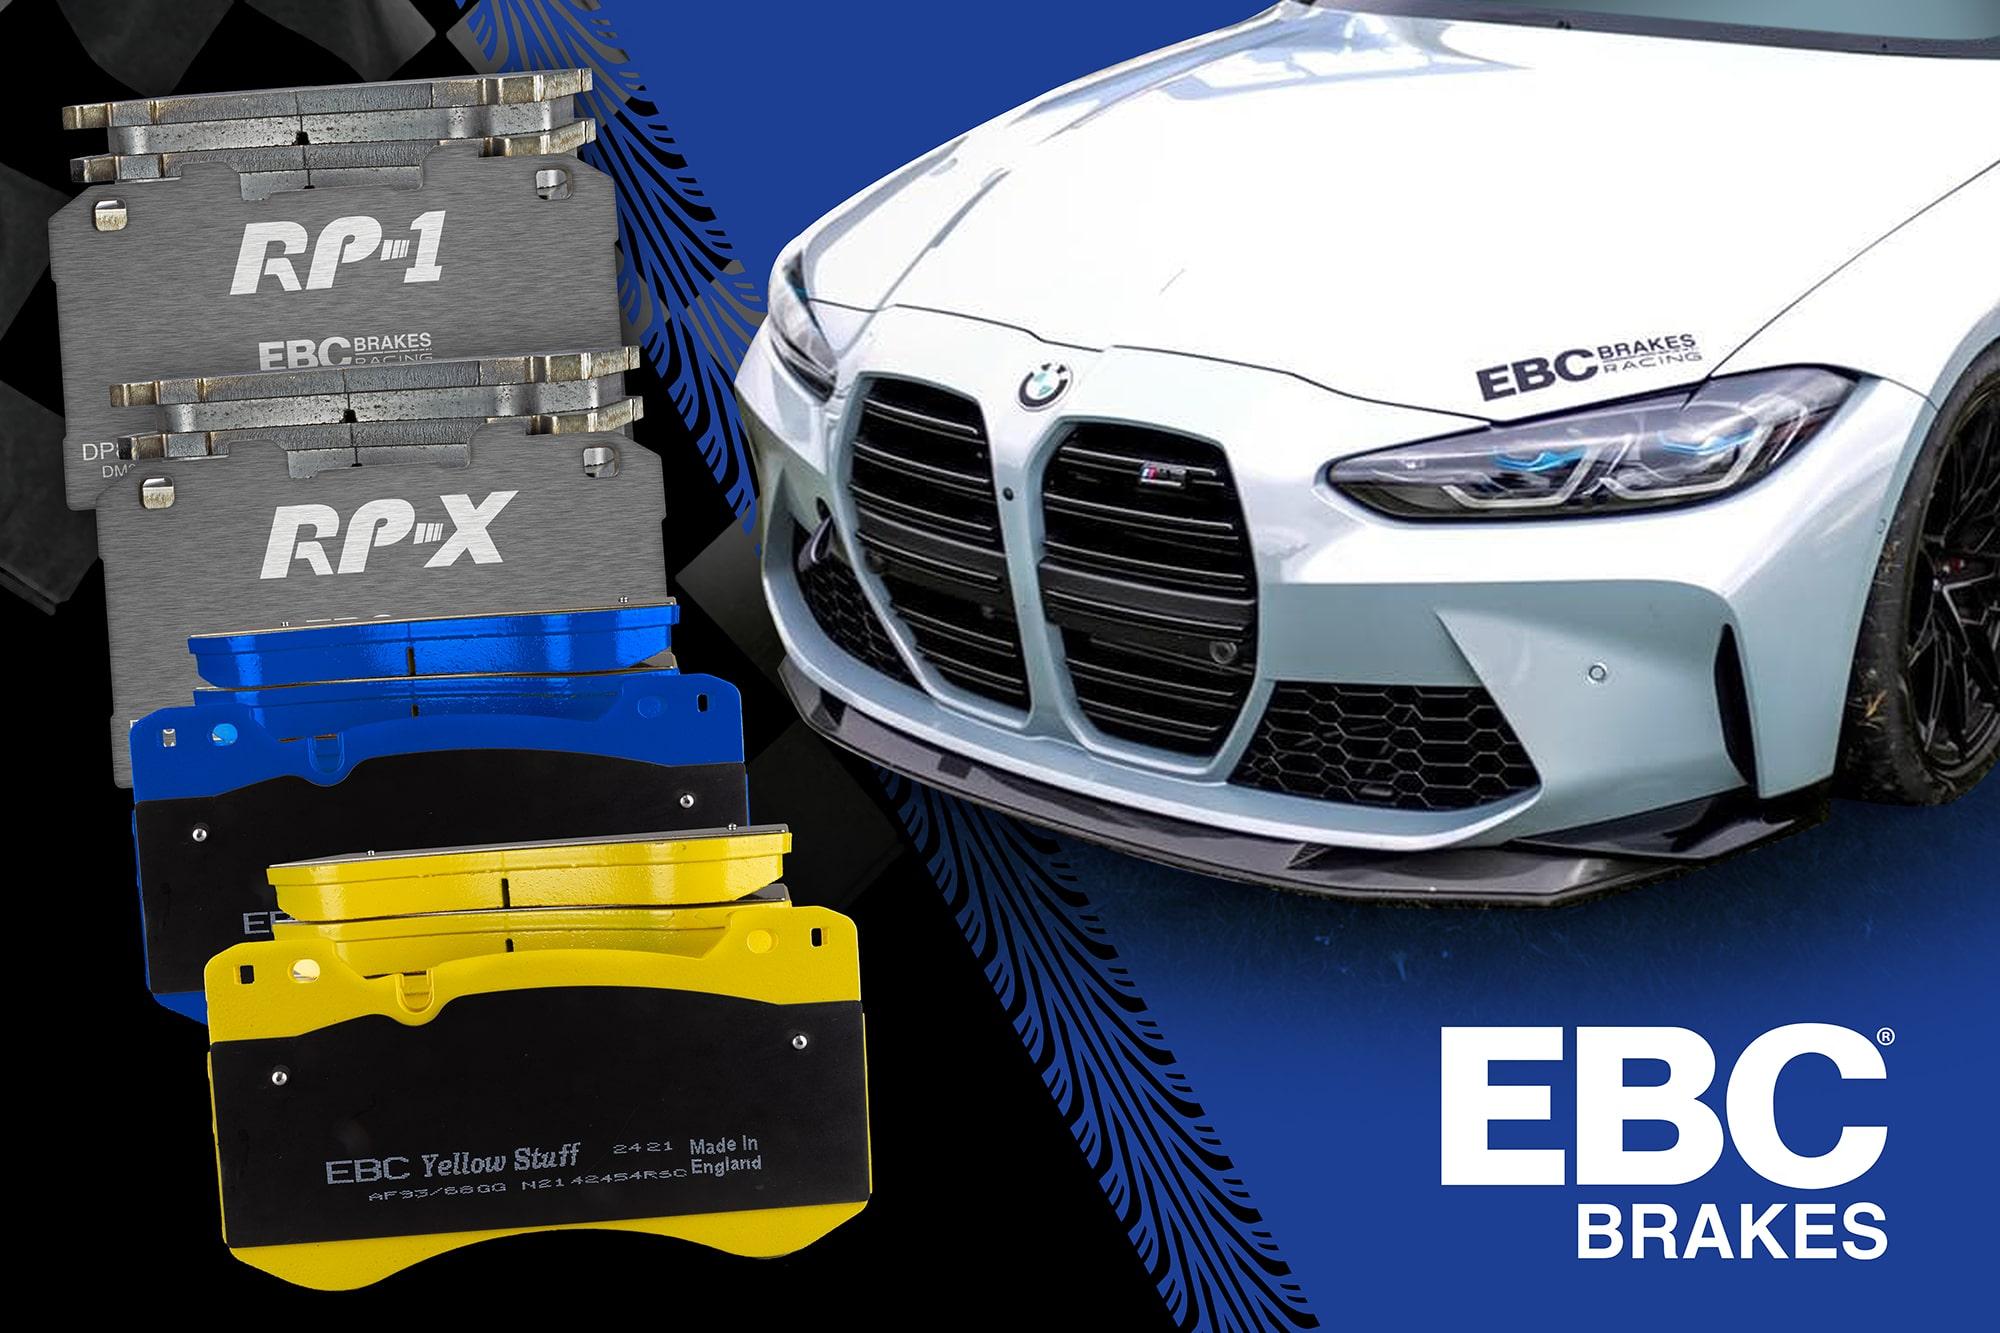 New Range of High-Performance Brake Pads for New BMW M3/M4 Models